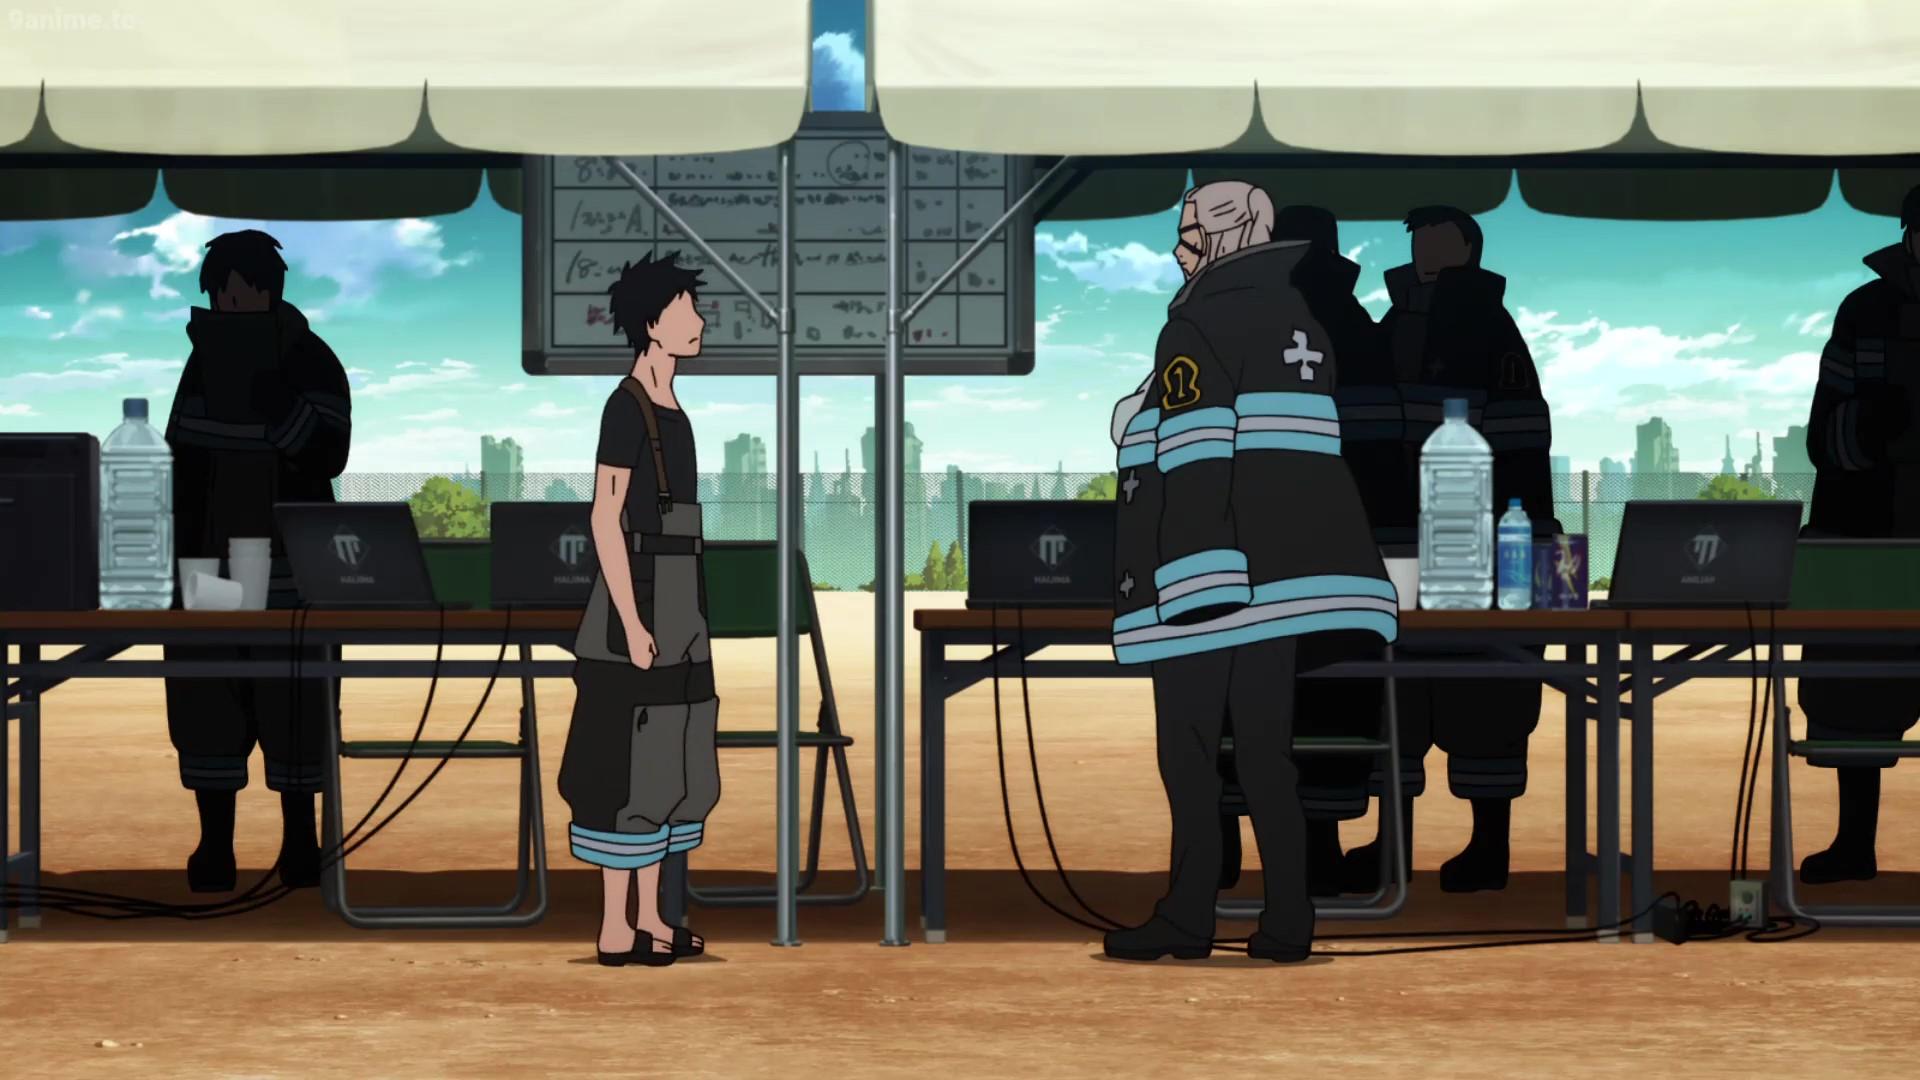 Watch Fire Force Episode 3 English Dubbed - AnimeGT